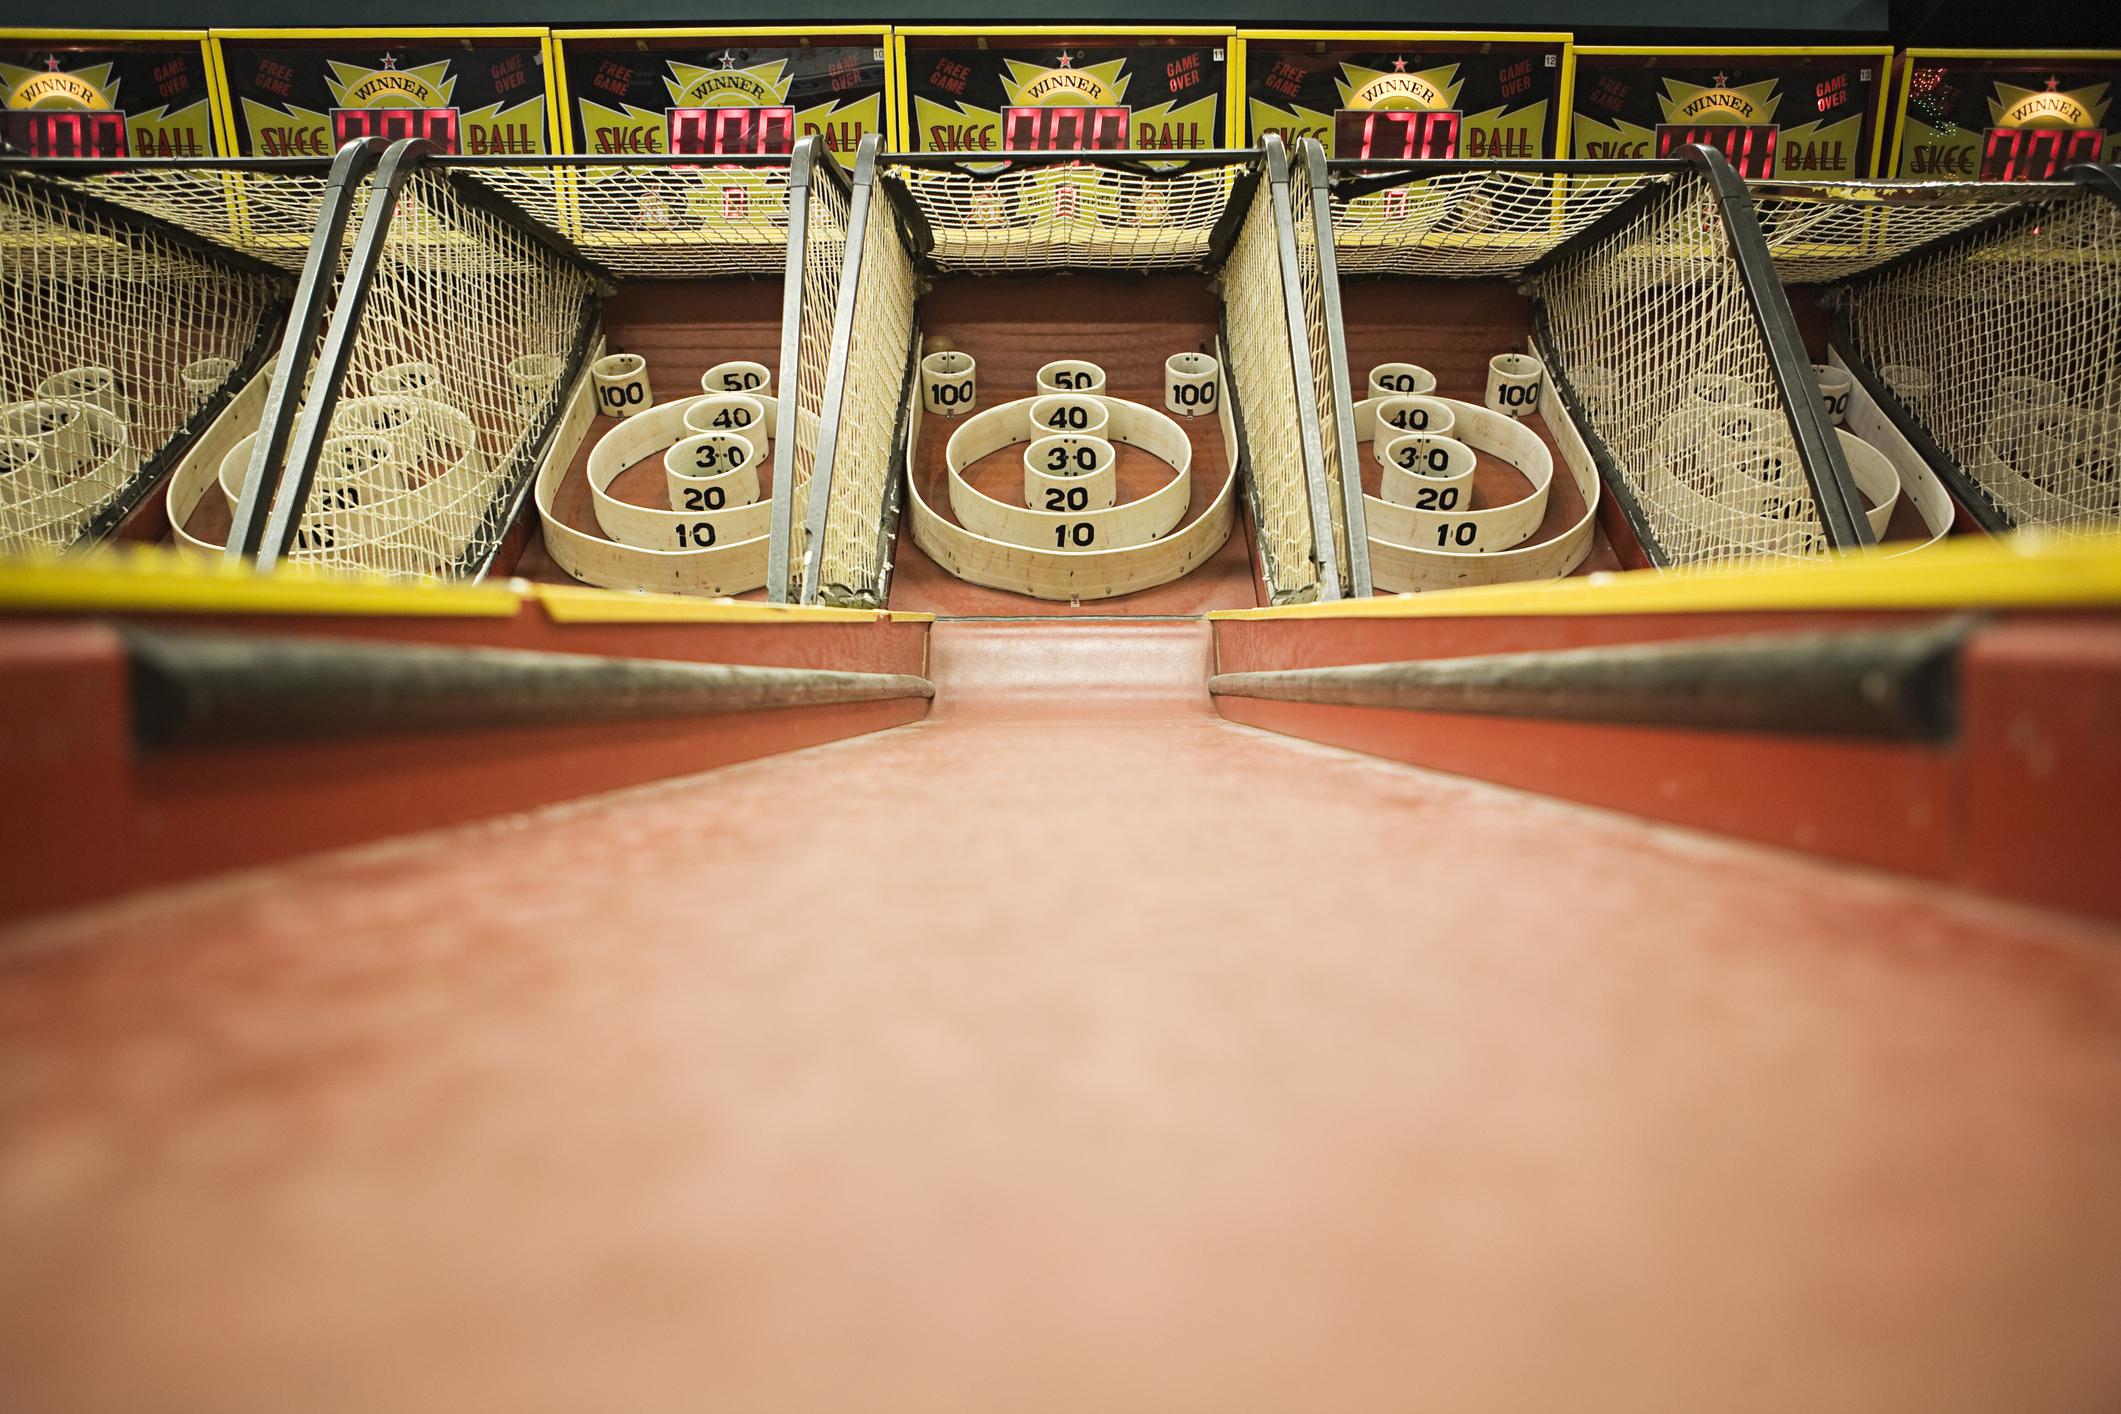 Skee ball game at an arcade.